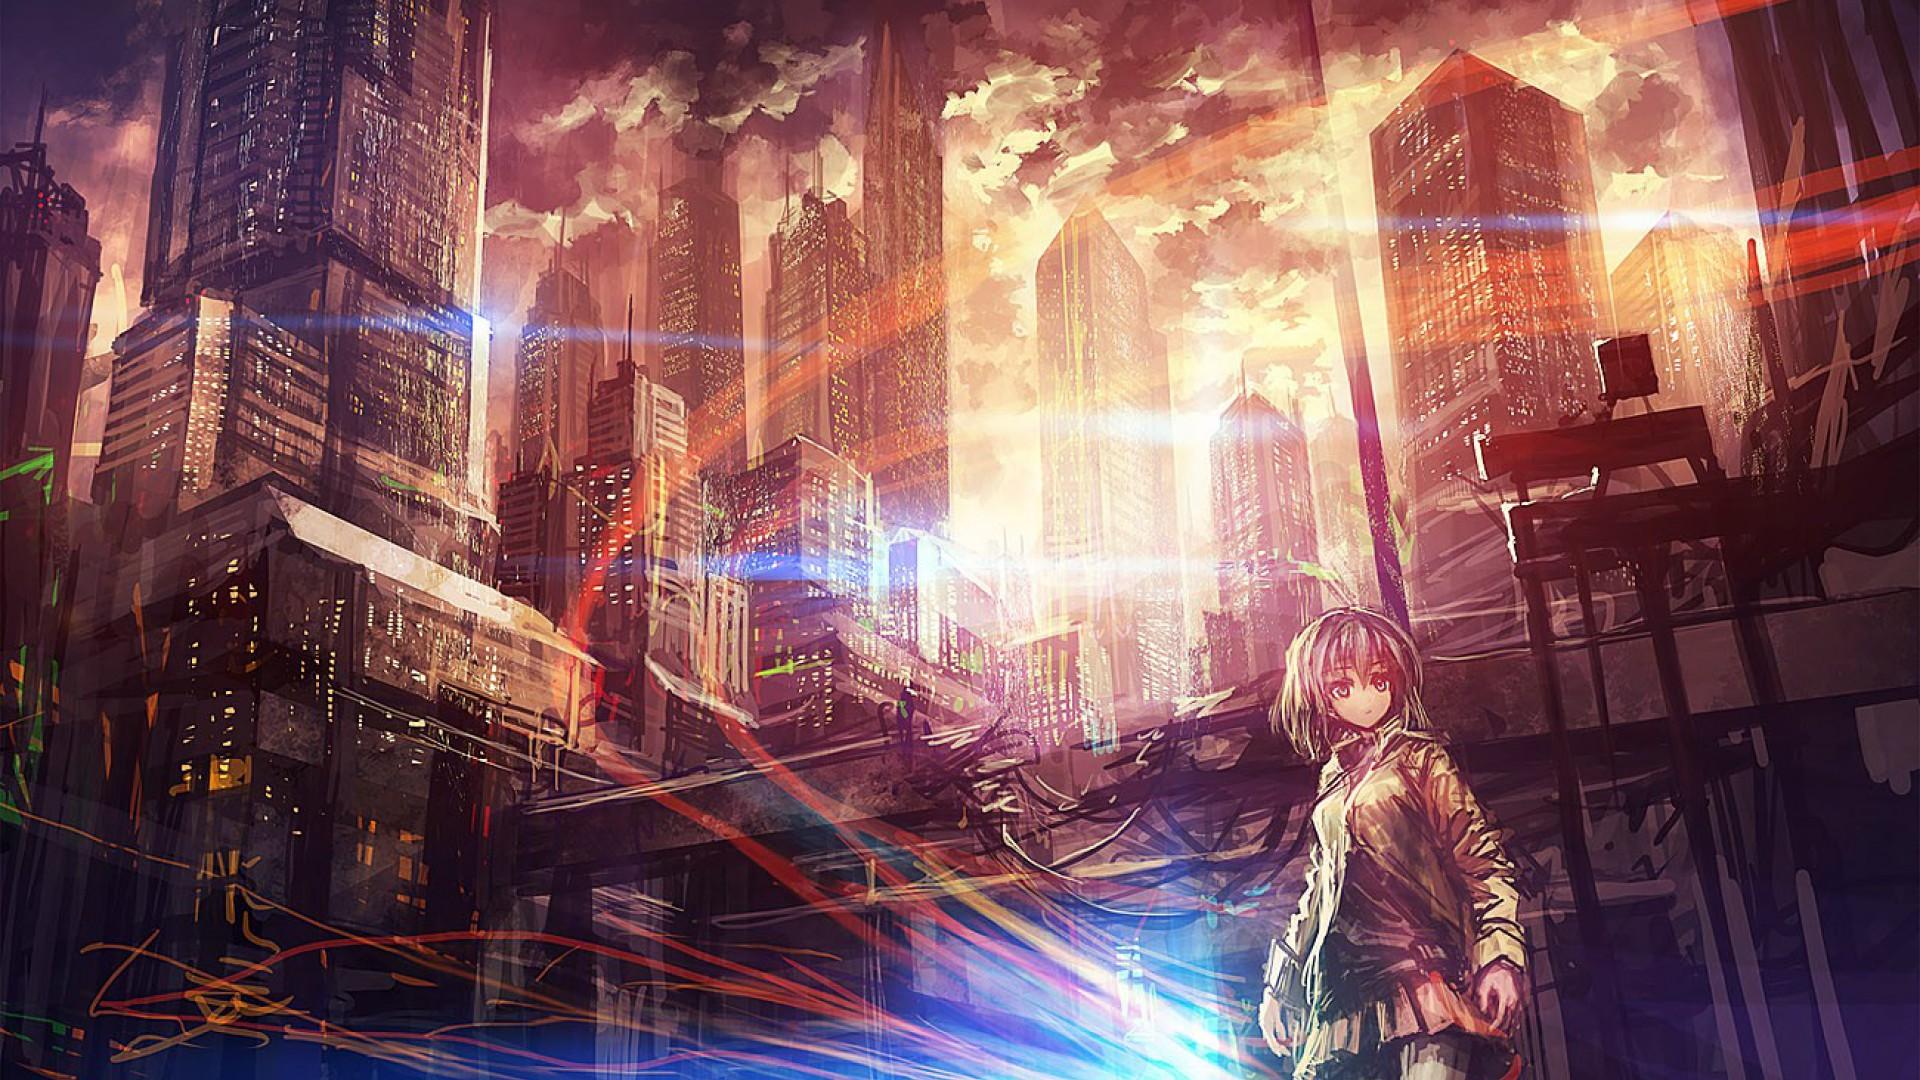 image - dark-anime-scenery-desktop-wallpapers | roleplay forum